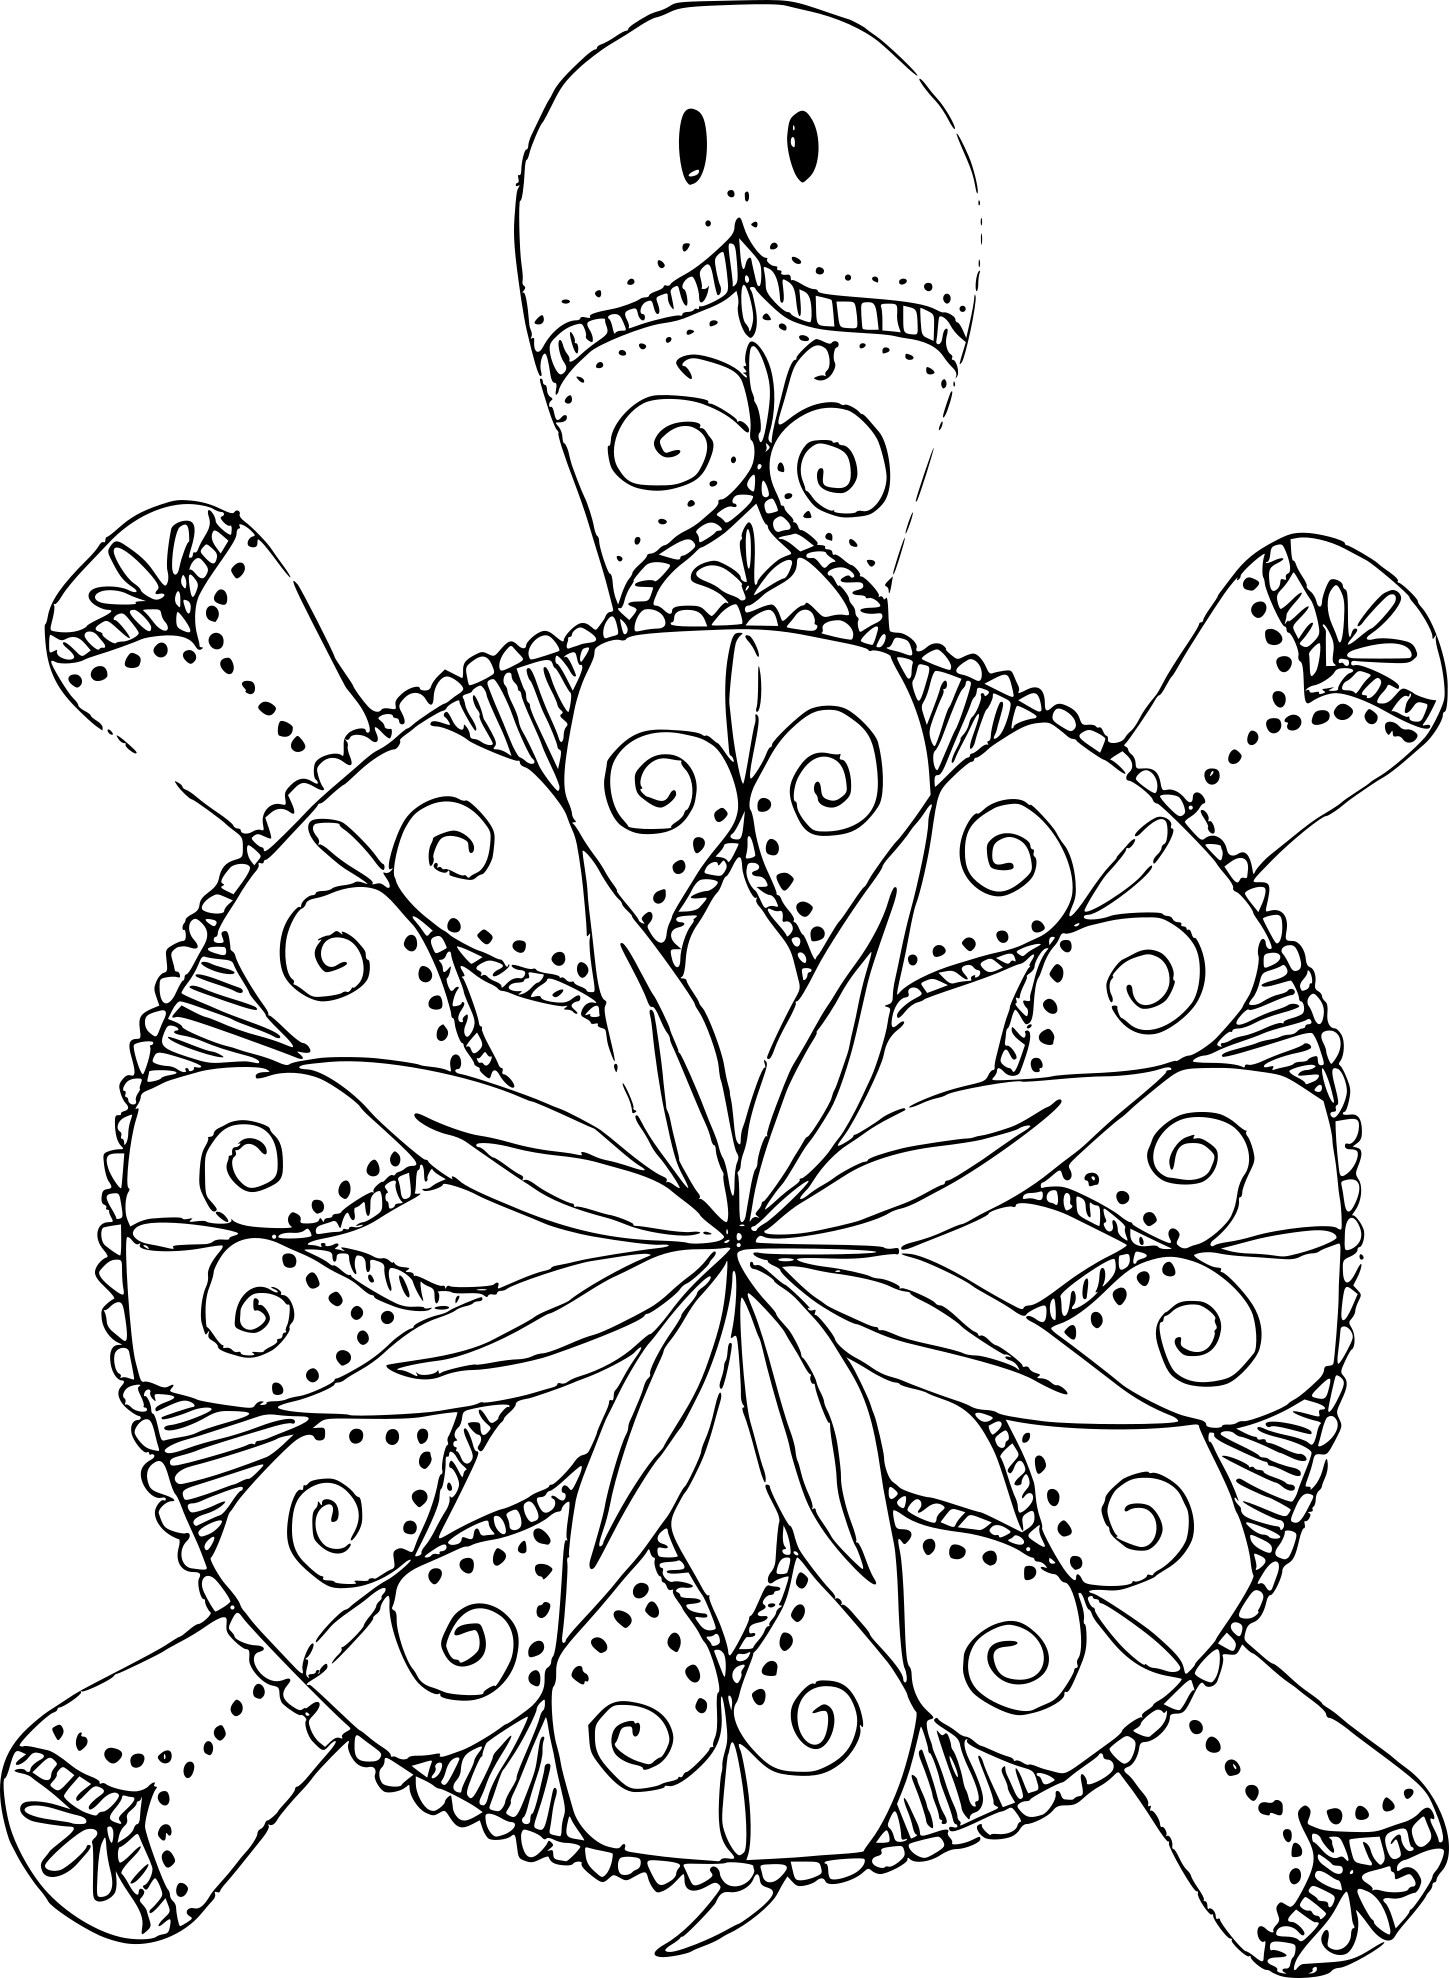 Coloriage Mandala Tortue À Imprimer avec Mandala À Imprimer Facile